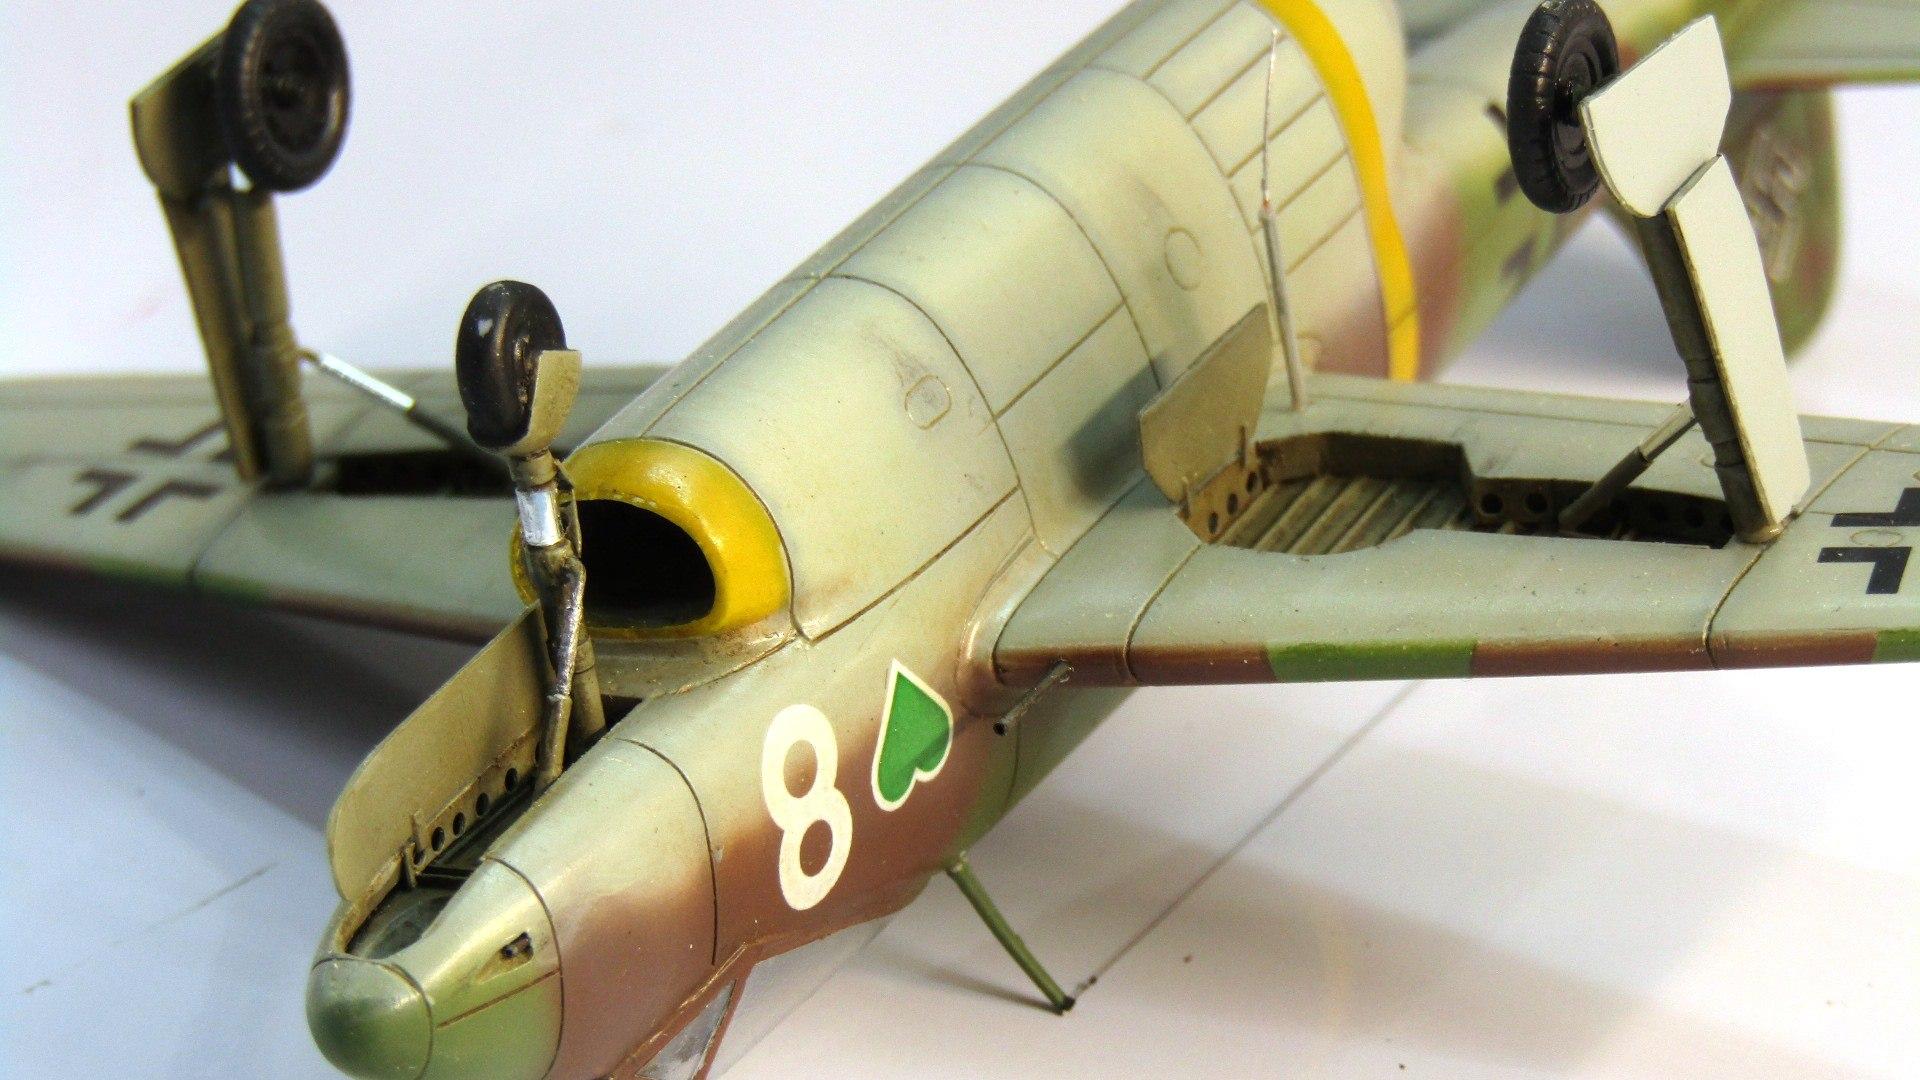 Fw-P-II 1/72 (Special Hobby) 4BzOIURlOuA